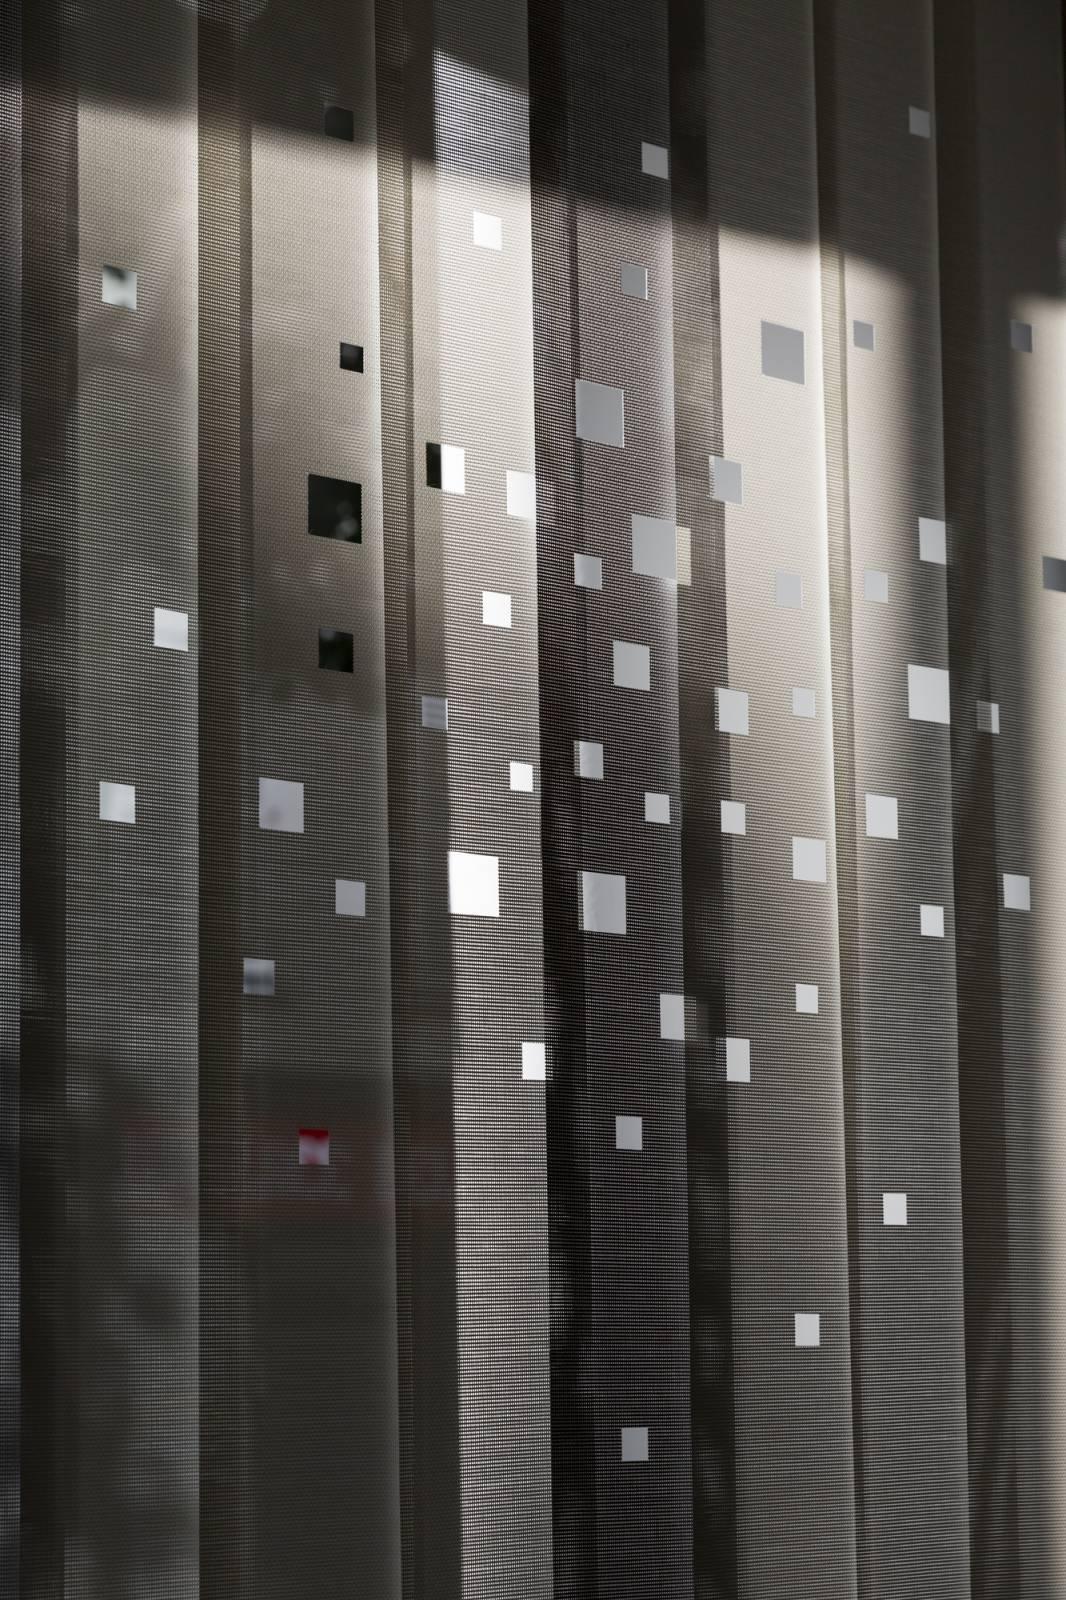 store lames verticales top store dcoration sur mesure stores bandes verticales dcoration with. Black Bedroom Furniture Sets. Home Design Ideas